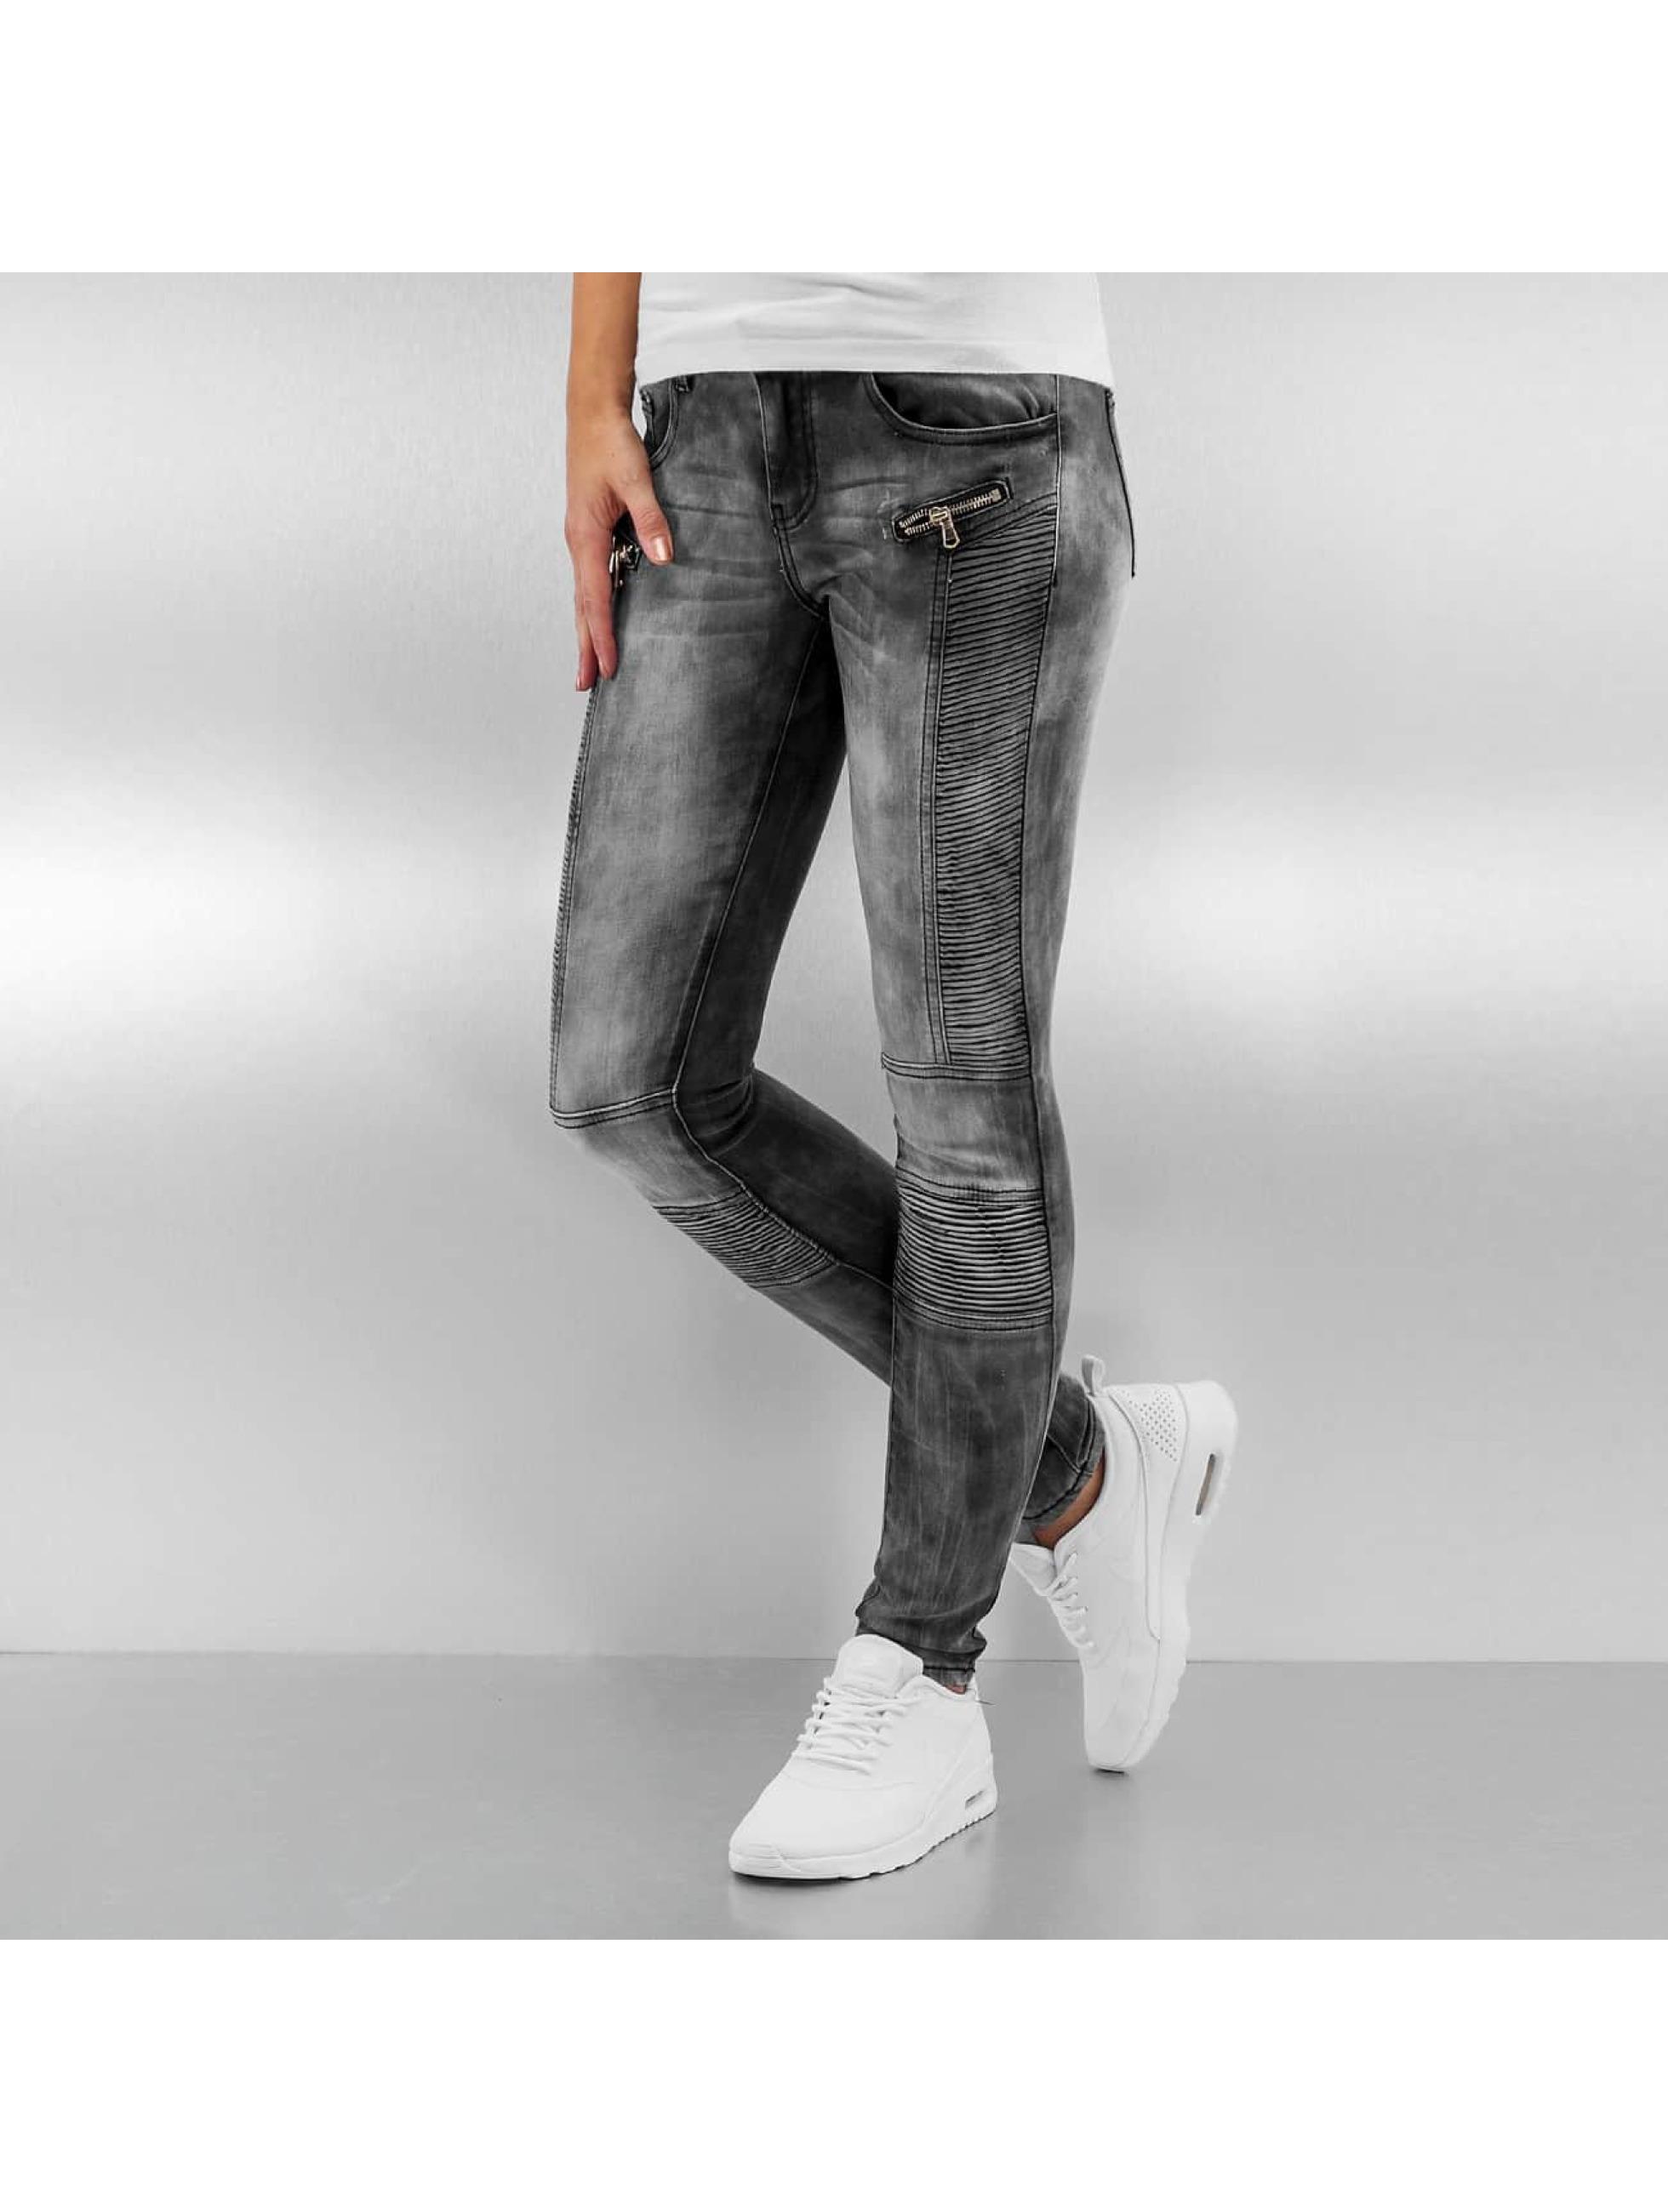 Sixth June Облегающие джинсы Washed Tie and Dye Bike серый